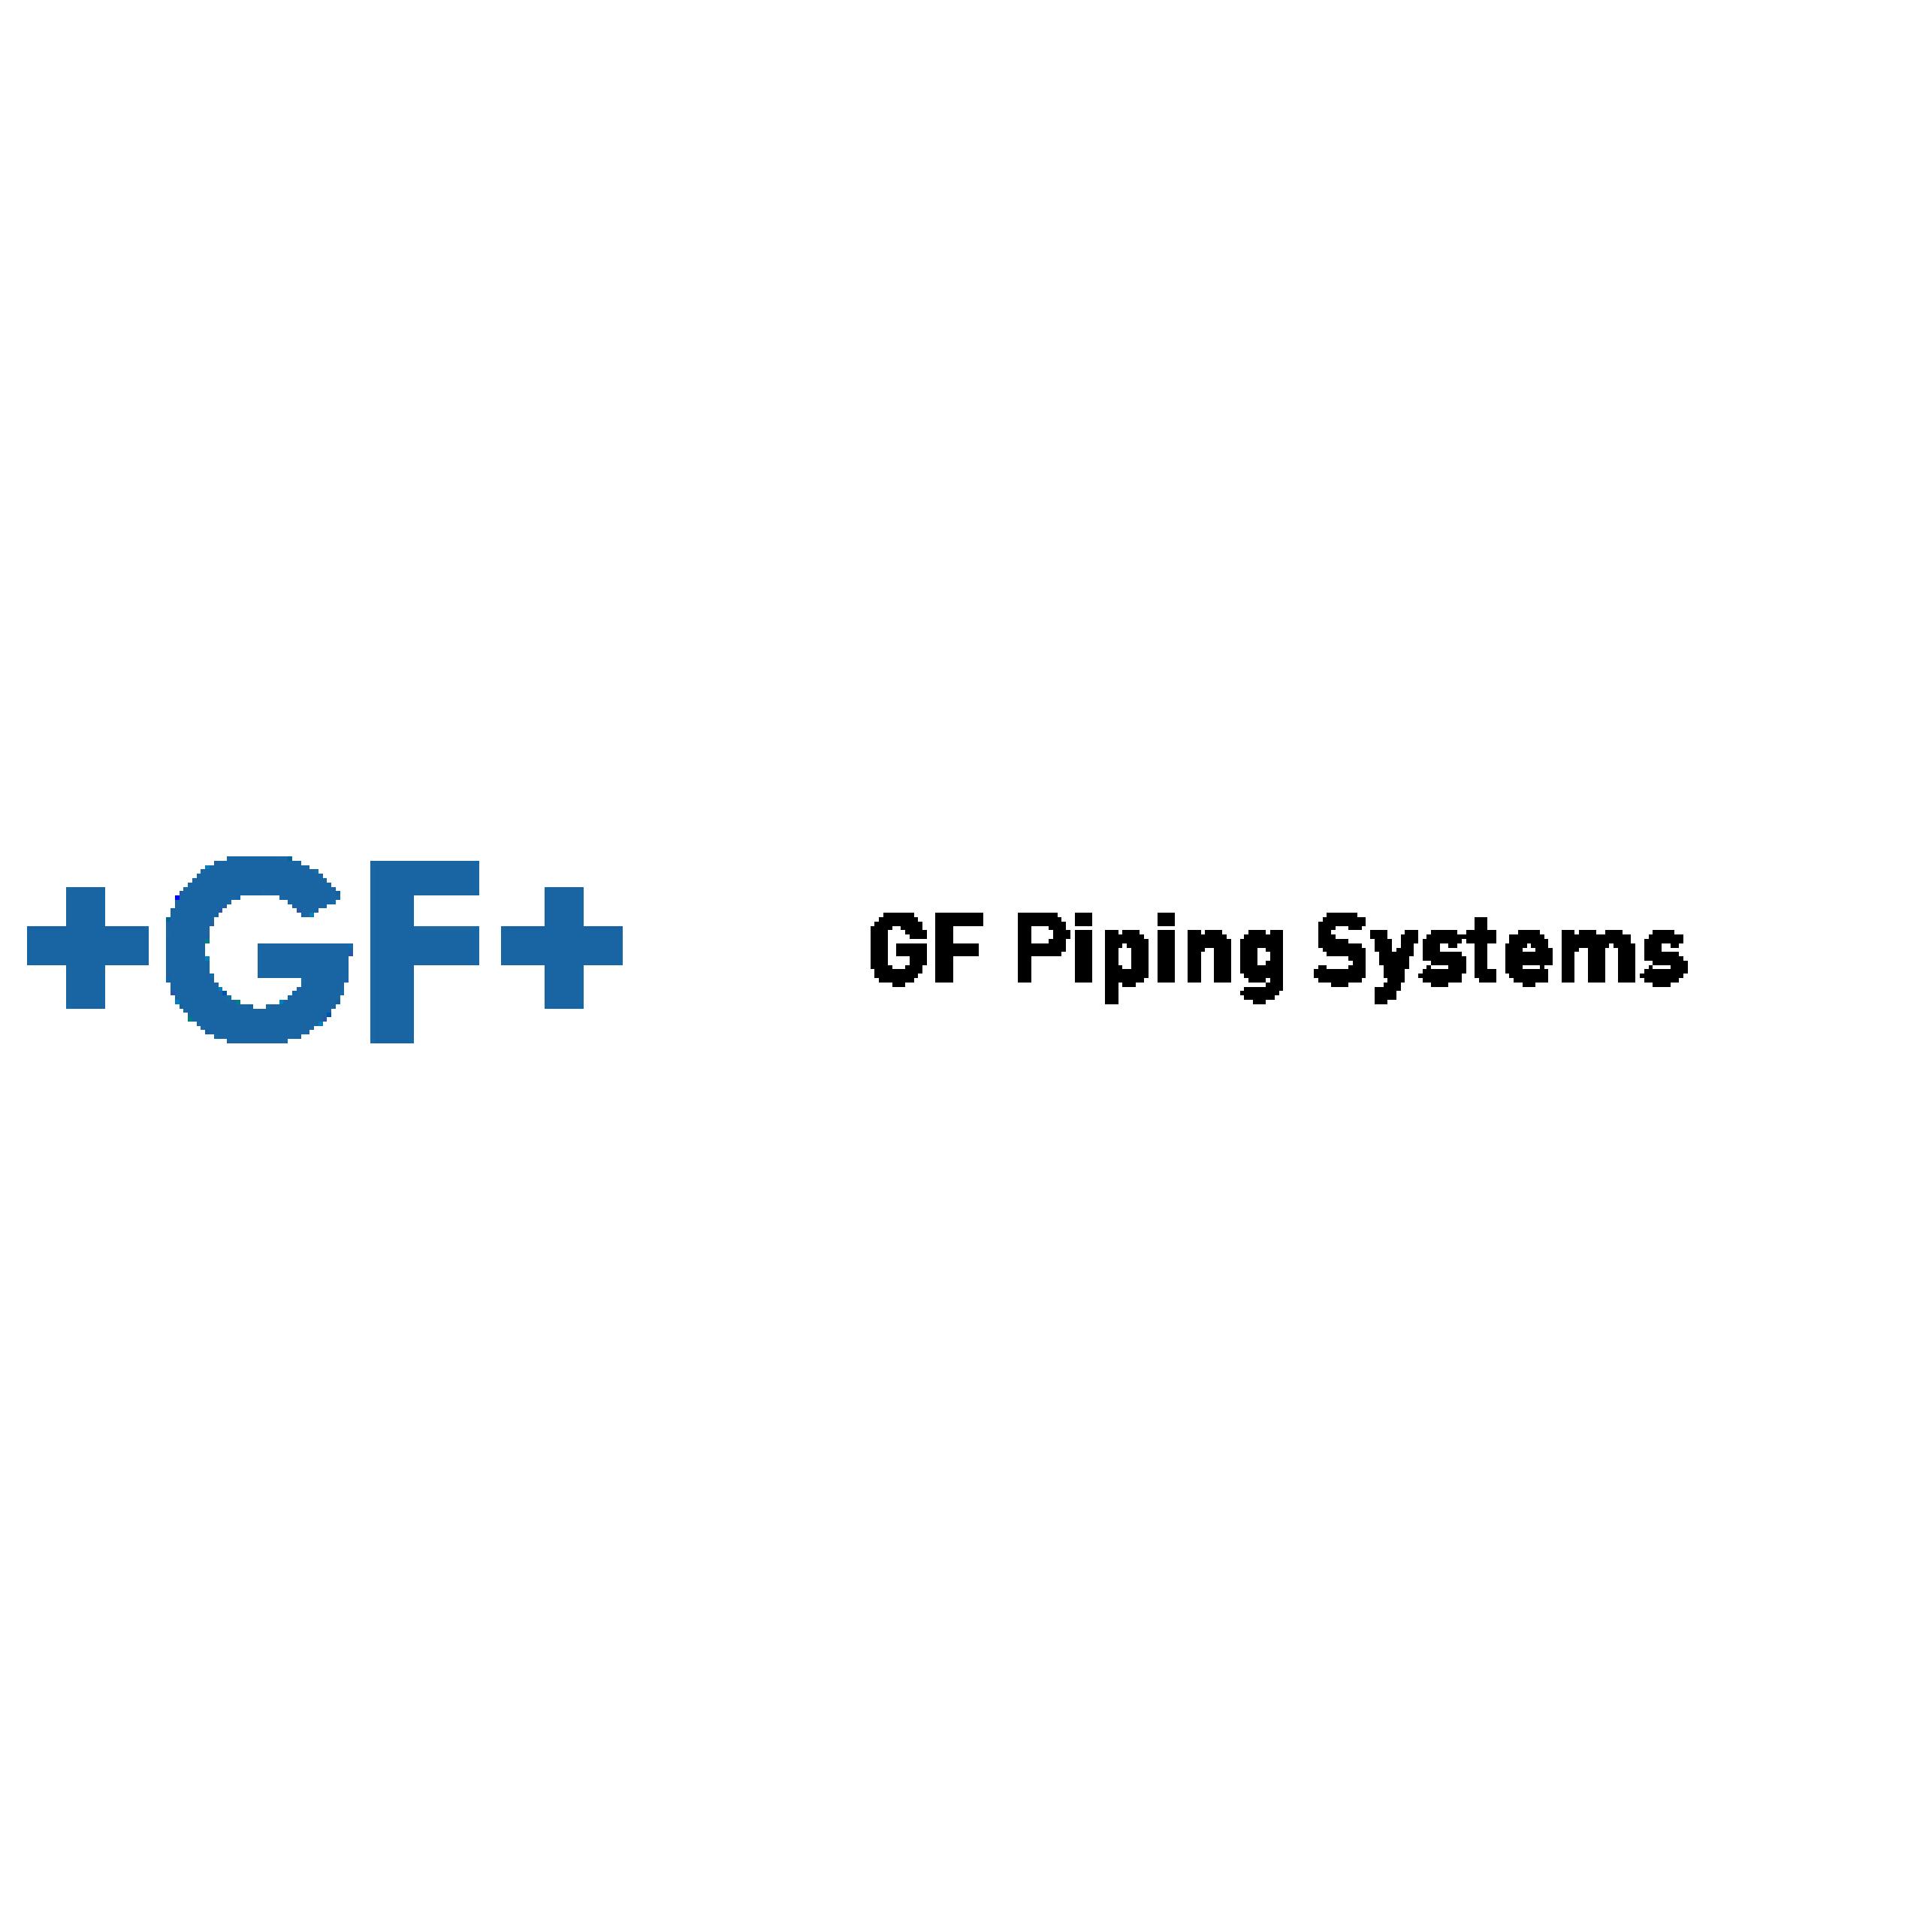 +GF+-01